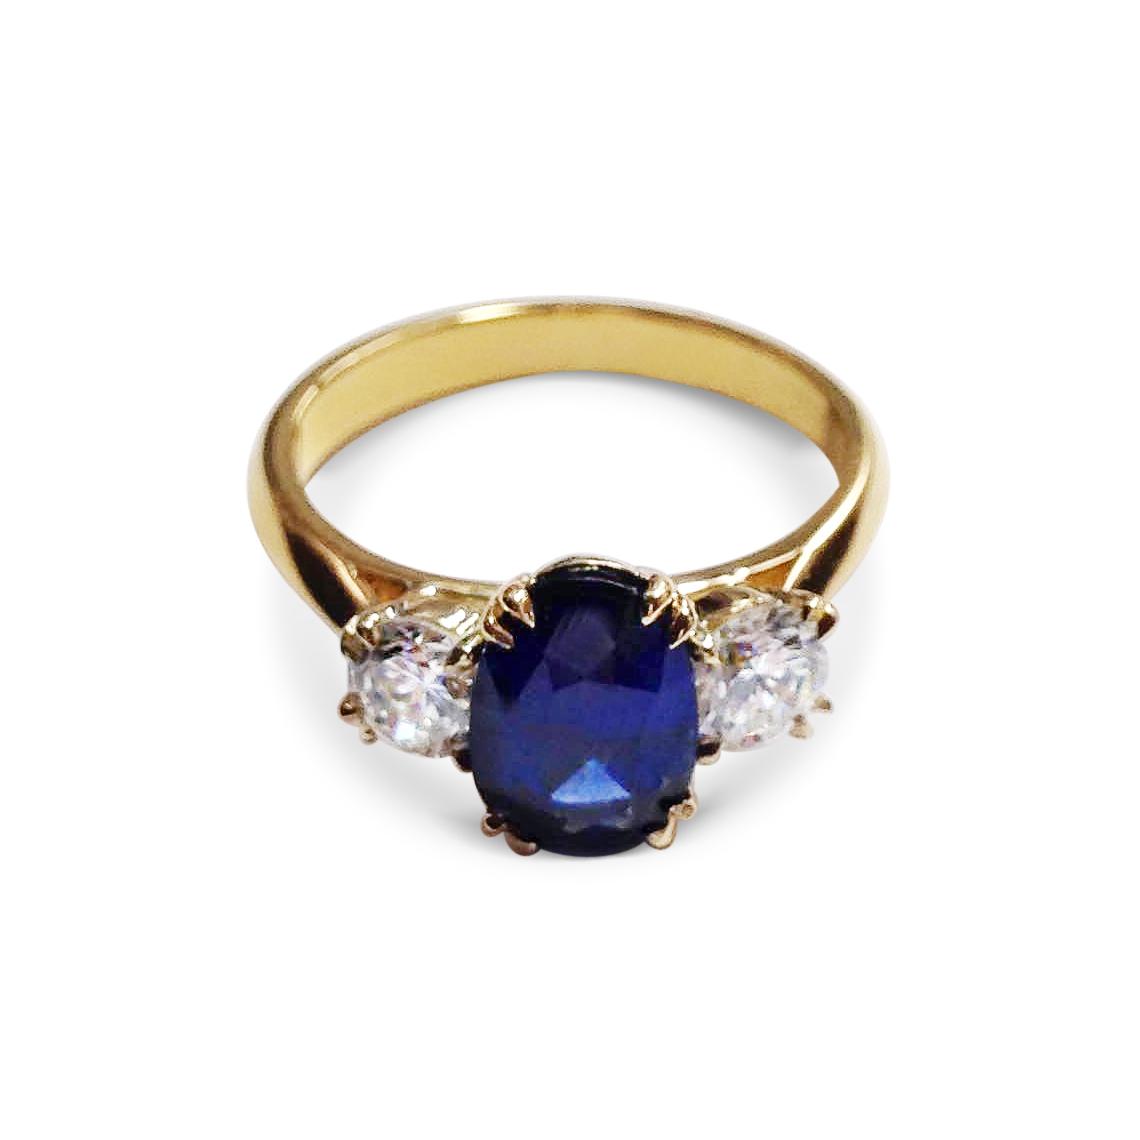 Sapphire-and-diamond-three-stone-ring-in-yellow-gold-2.jpg